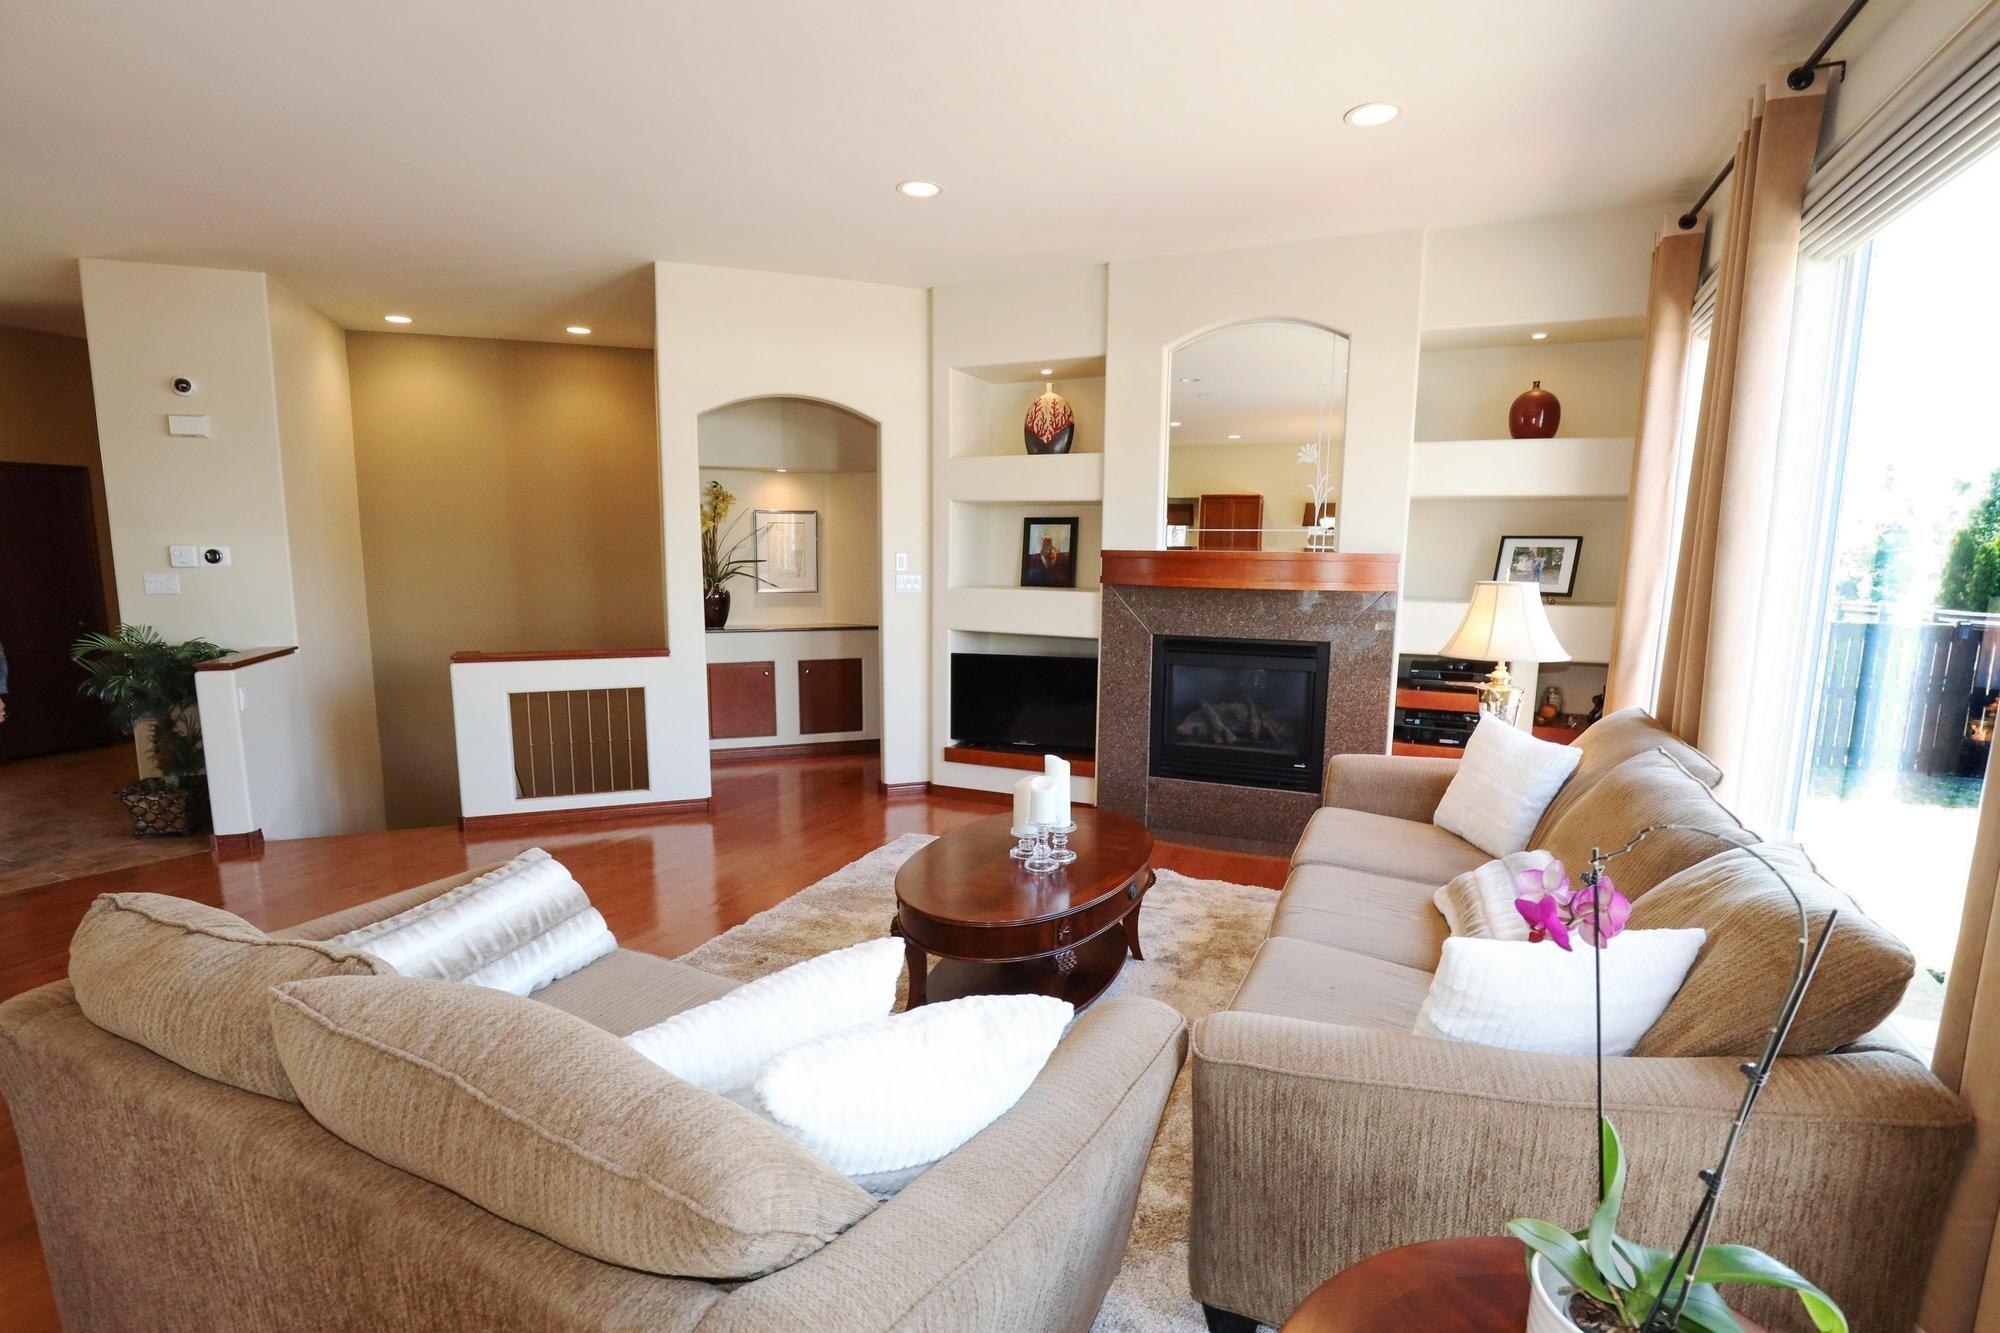 Photo 9: Photos: 7 Castle Ridge Drive in Winnipeg: Linden Ridge Single Family Detached for sale (1M)  : MLS®# 202107901